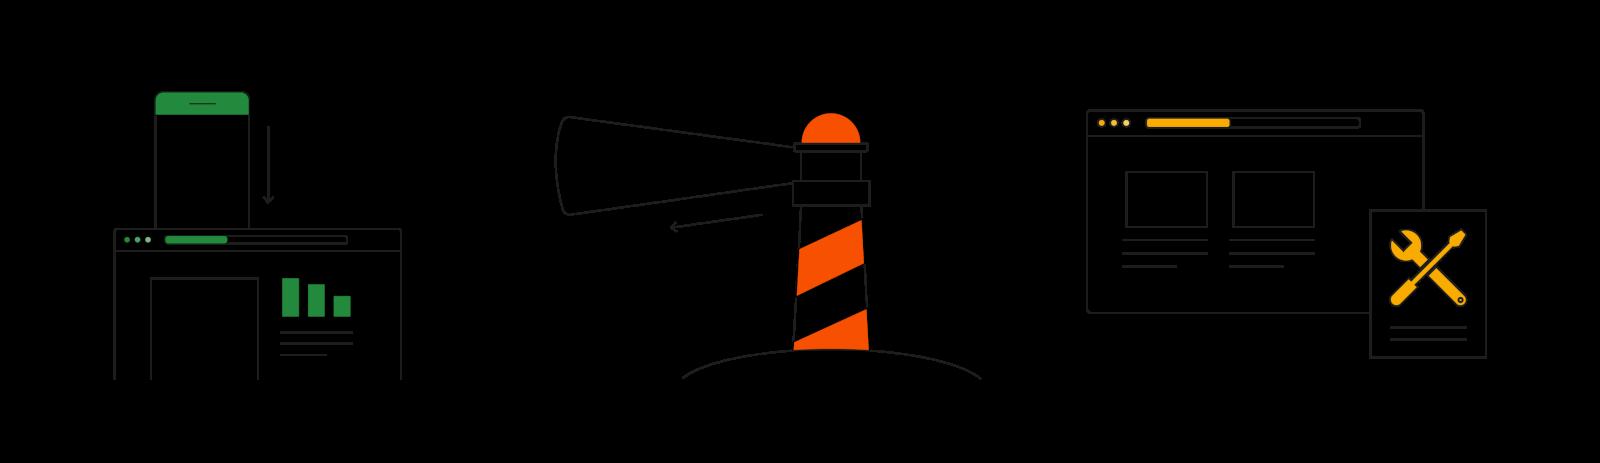 Speed tools graphics